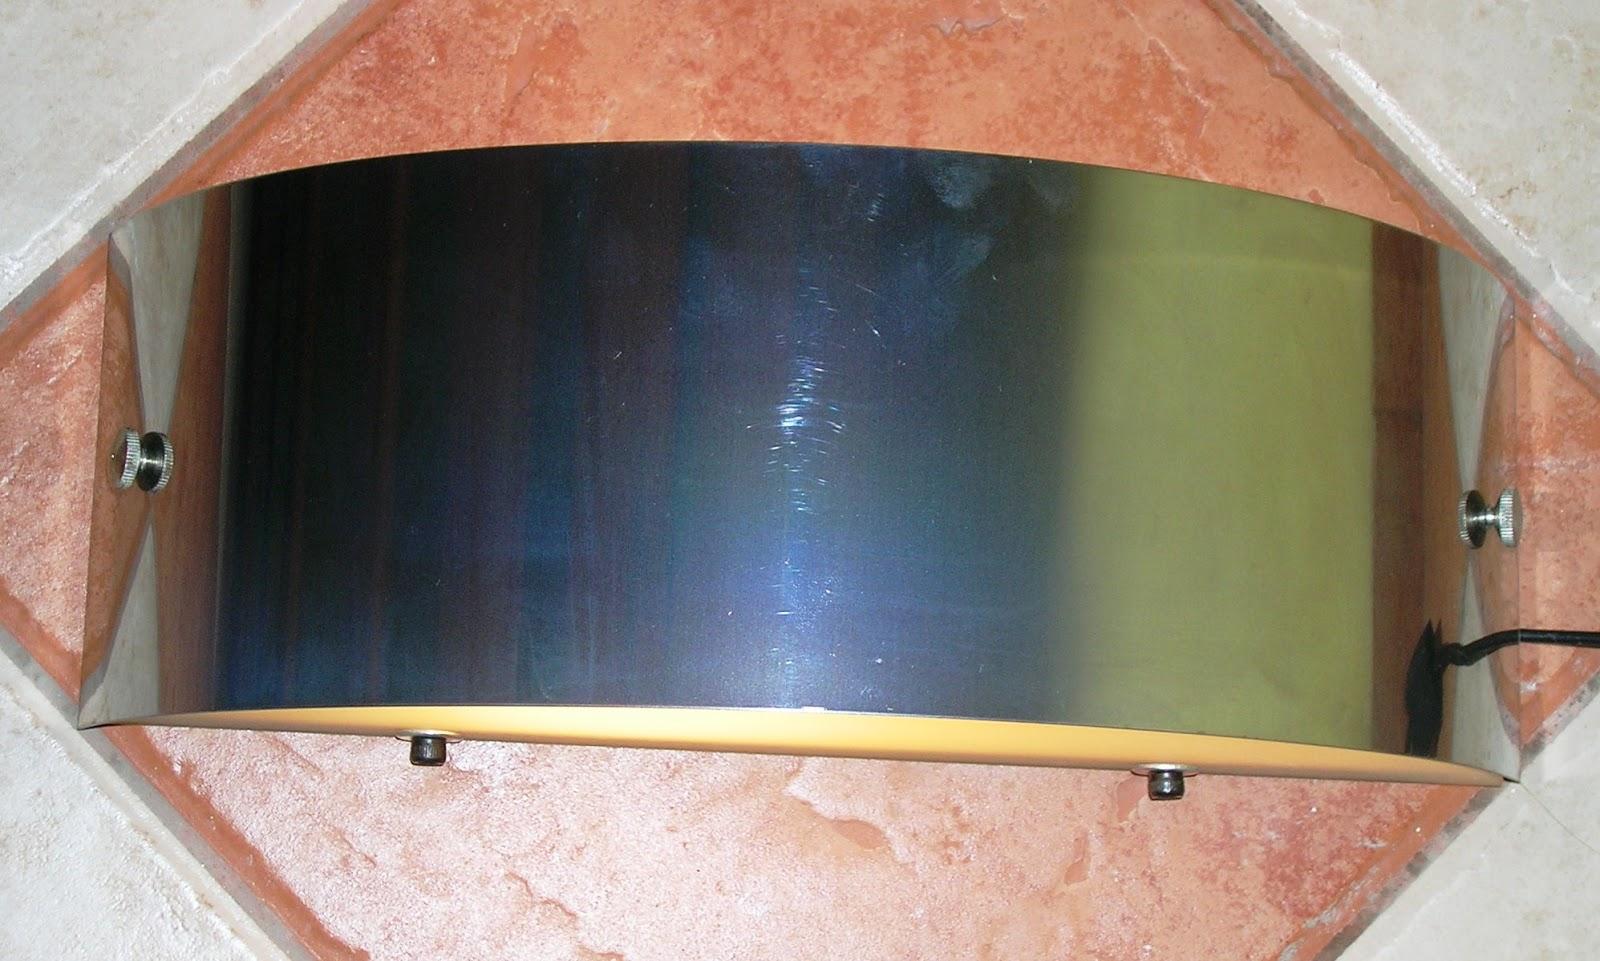 Argento iluminacion decorativa bidireccional vidrio acero - Iluminacion decorativa interiores ...